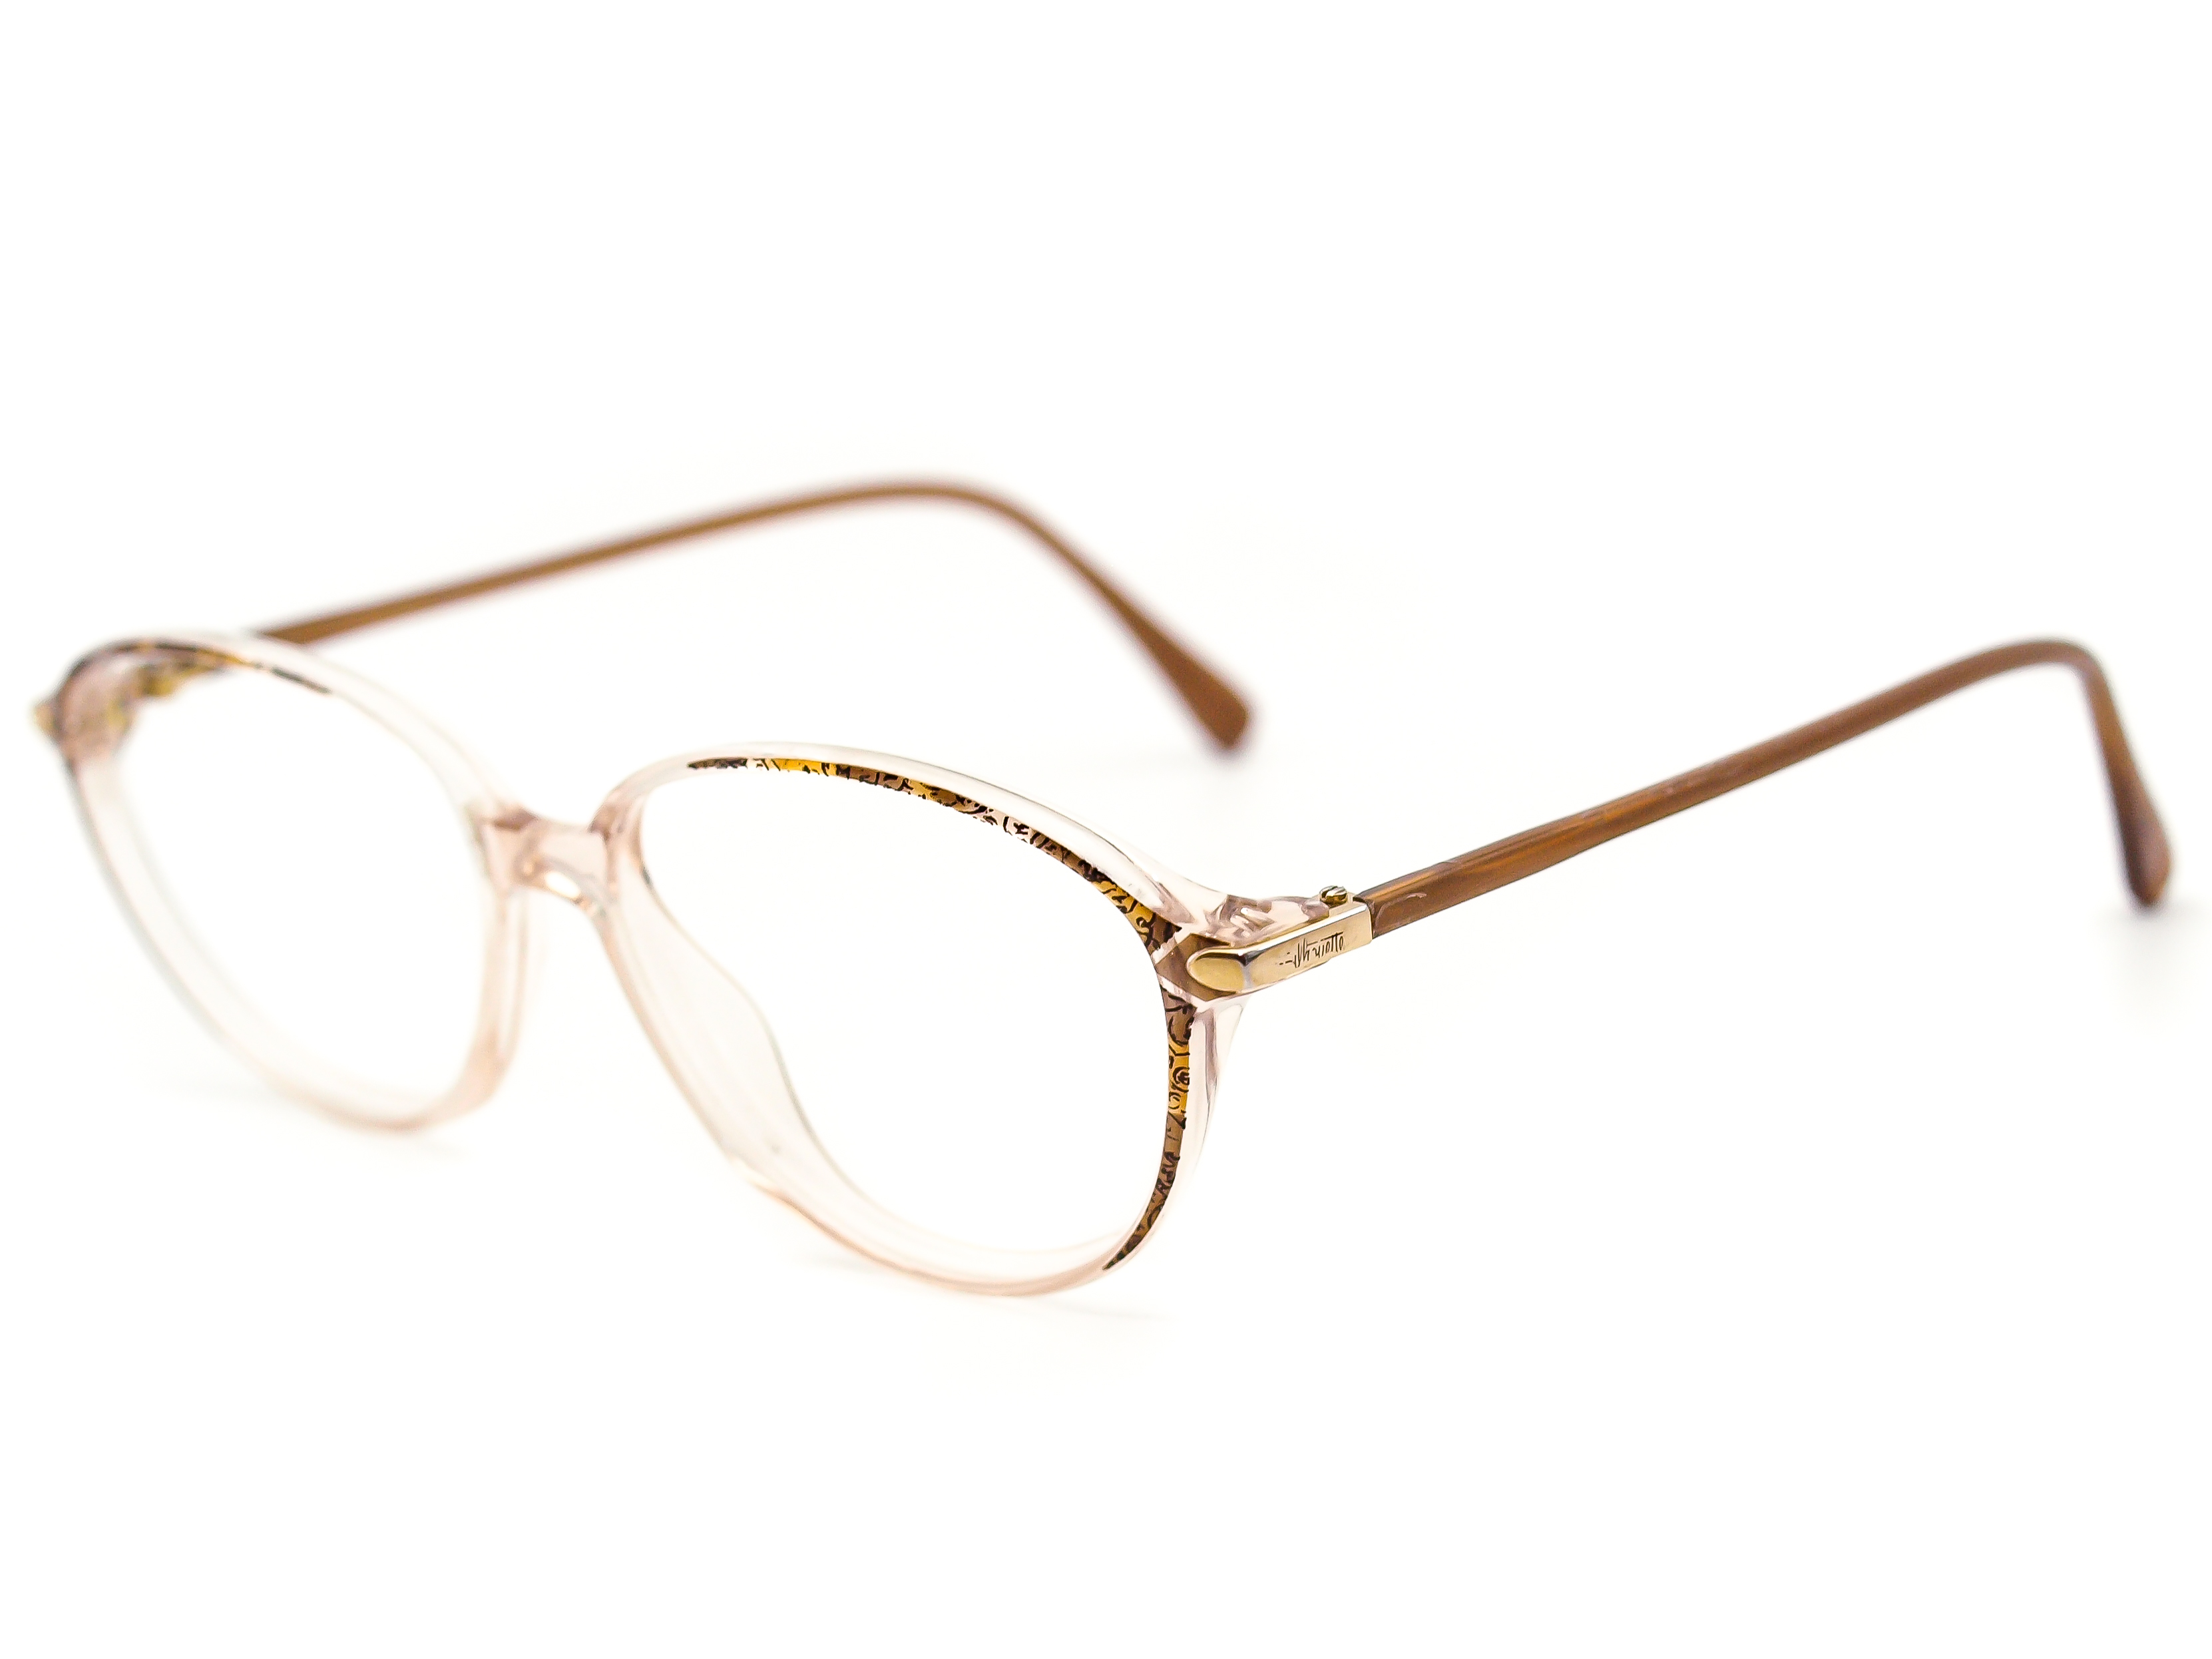 b4999f40deeb Silhouette Vintage 6062 Eyeglasses